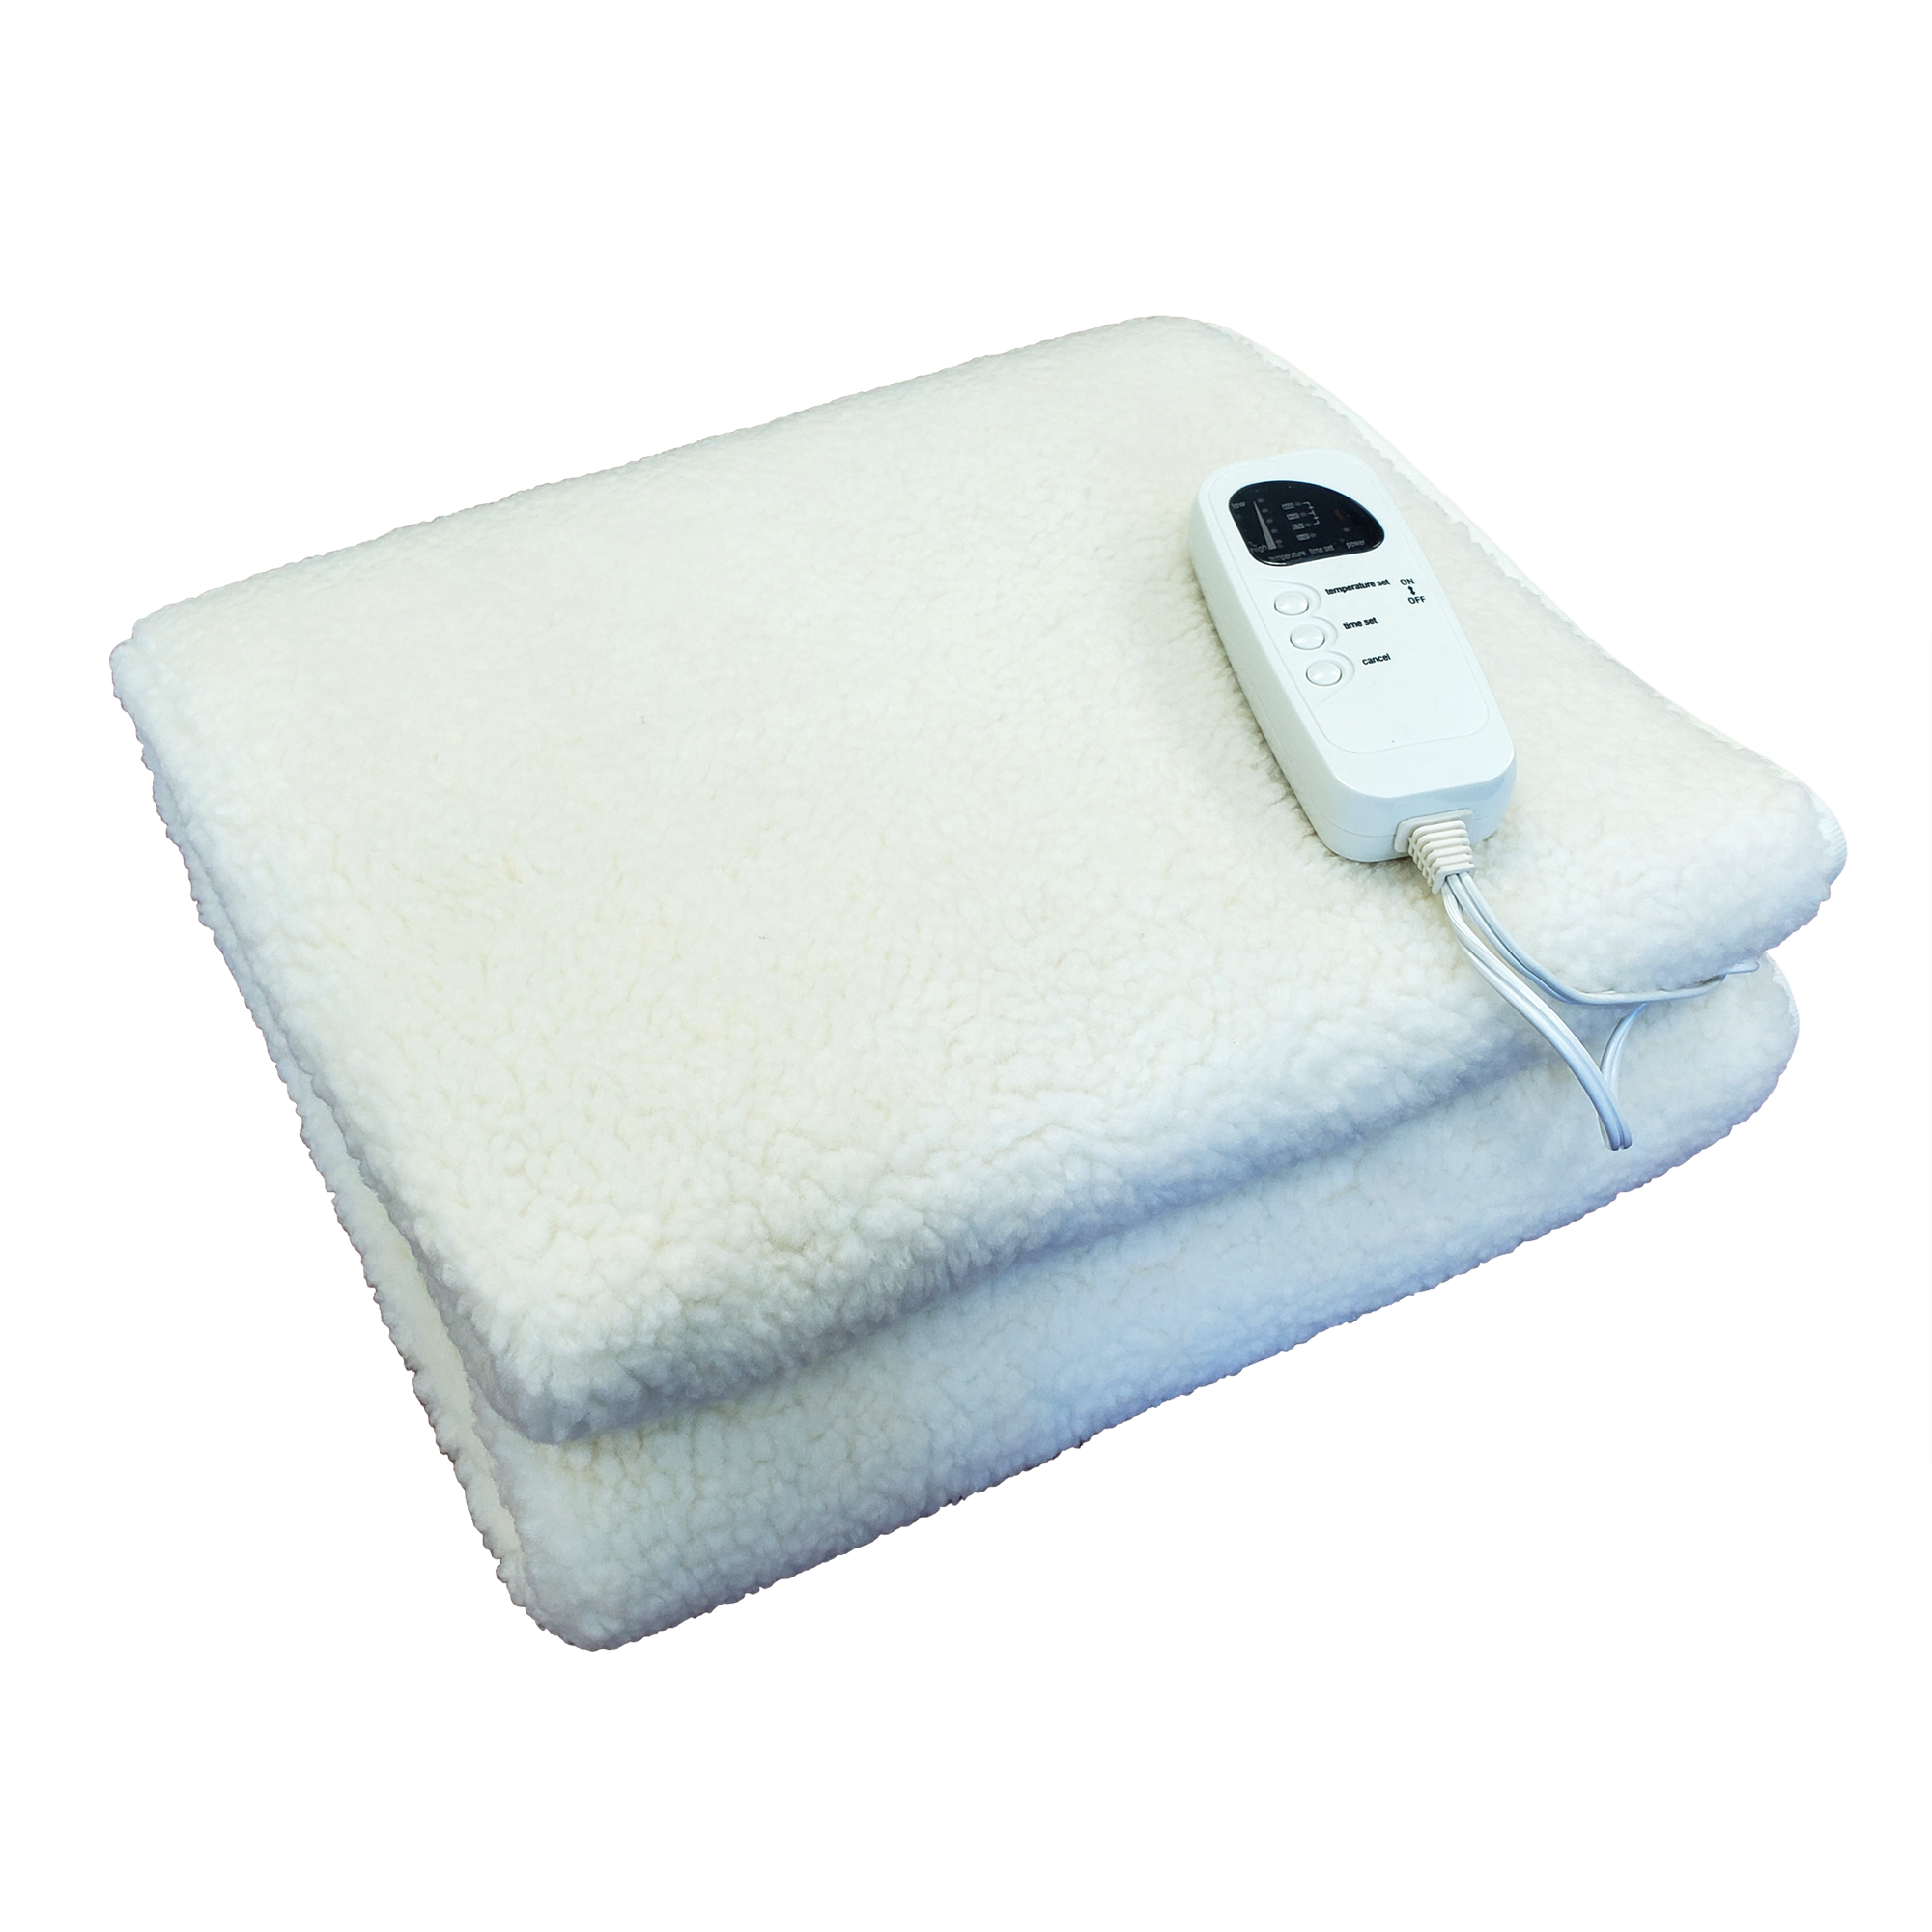 TOA Massage Table Warmer Fleece Pad Cover Blanket- 5 Heat Settings